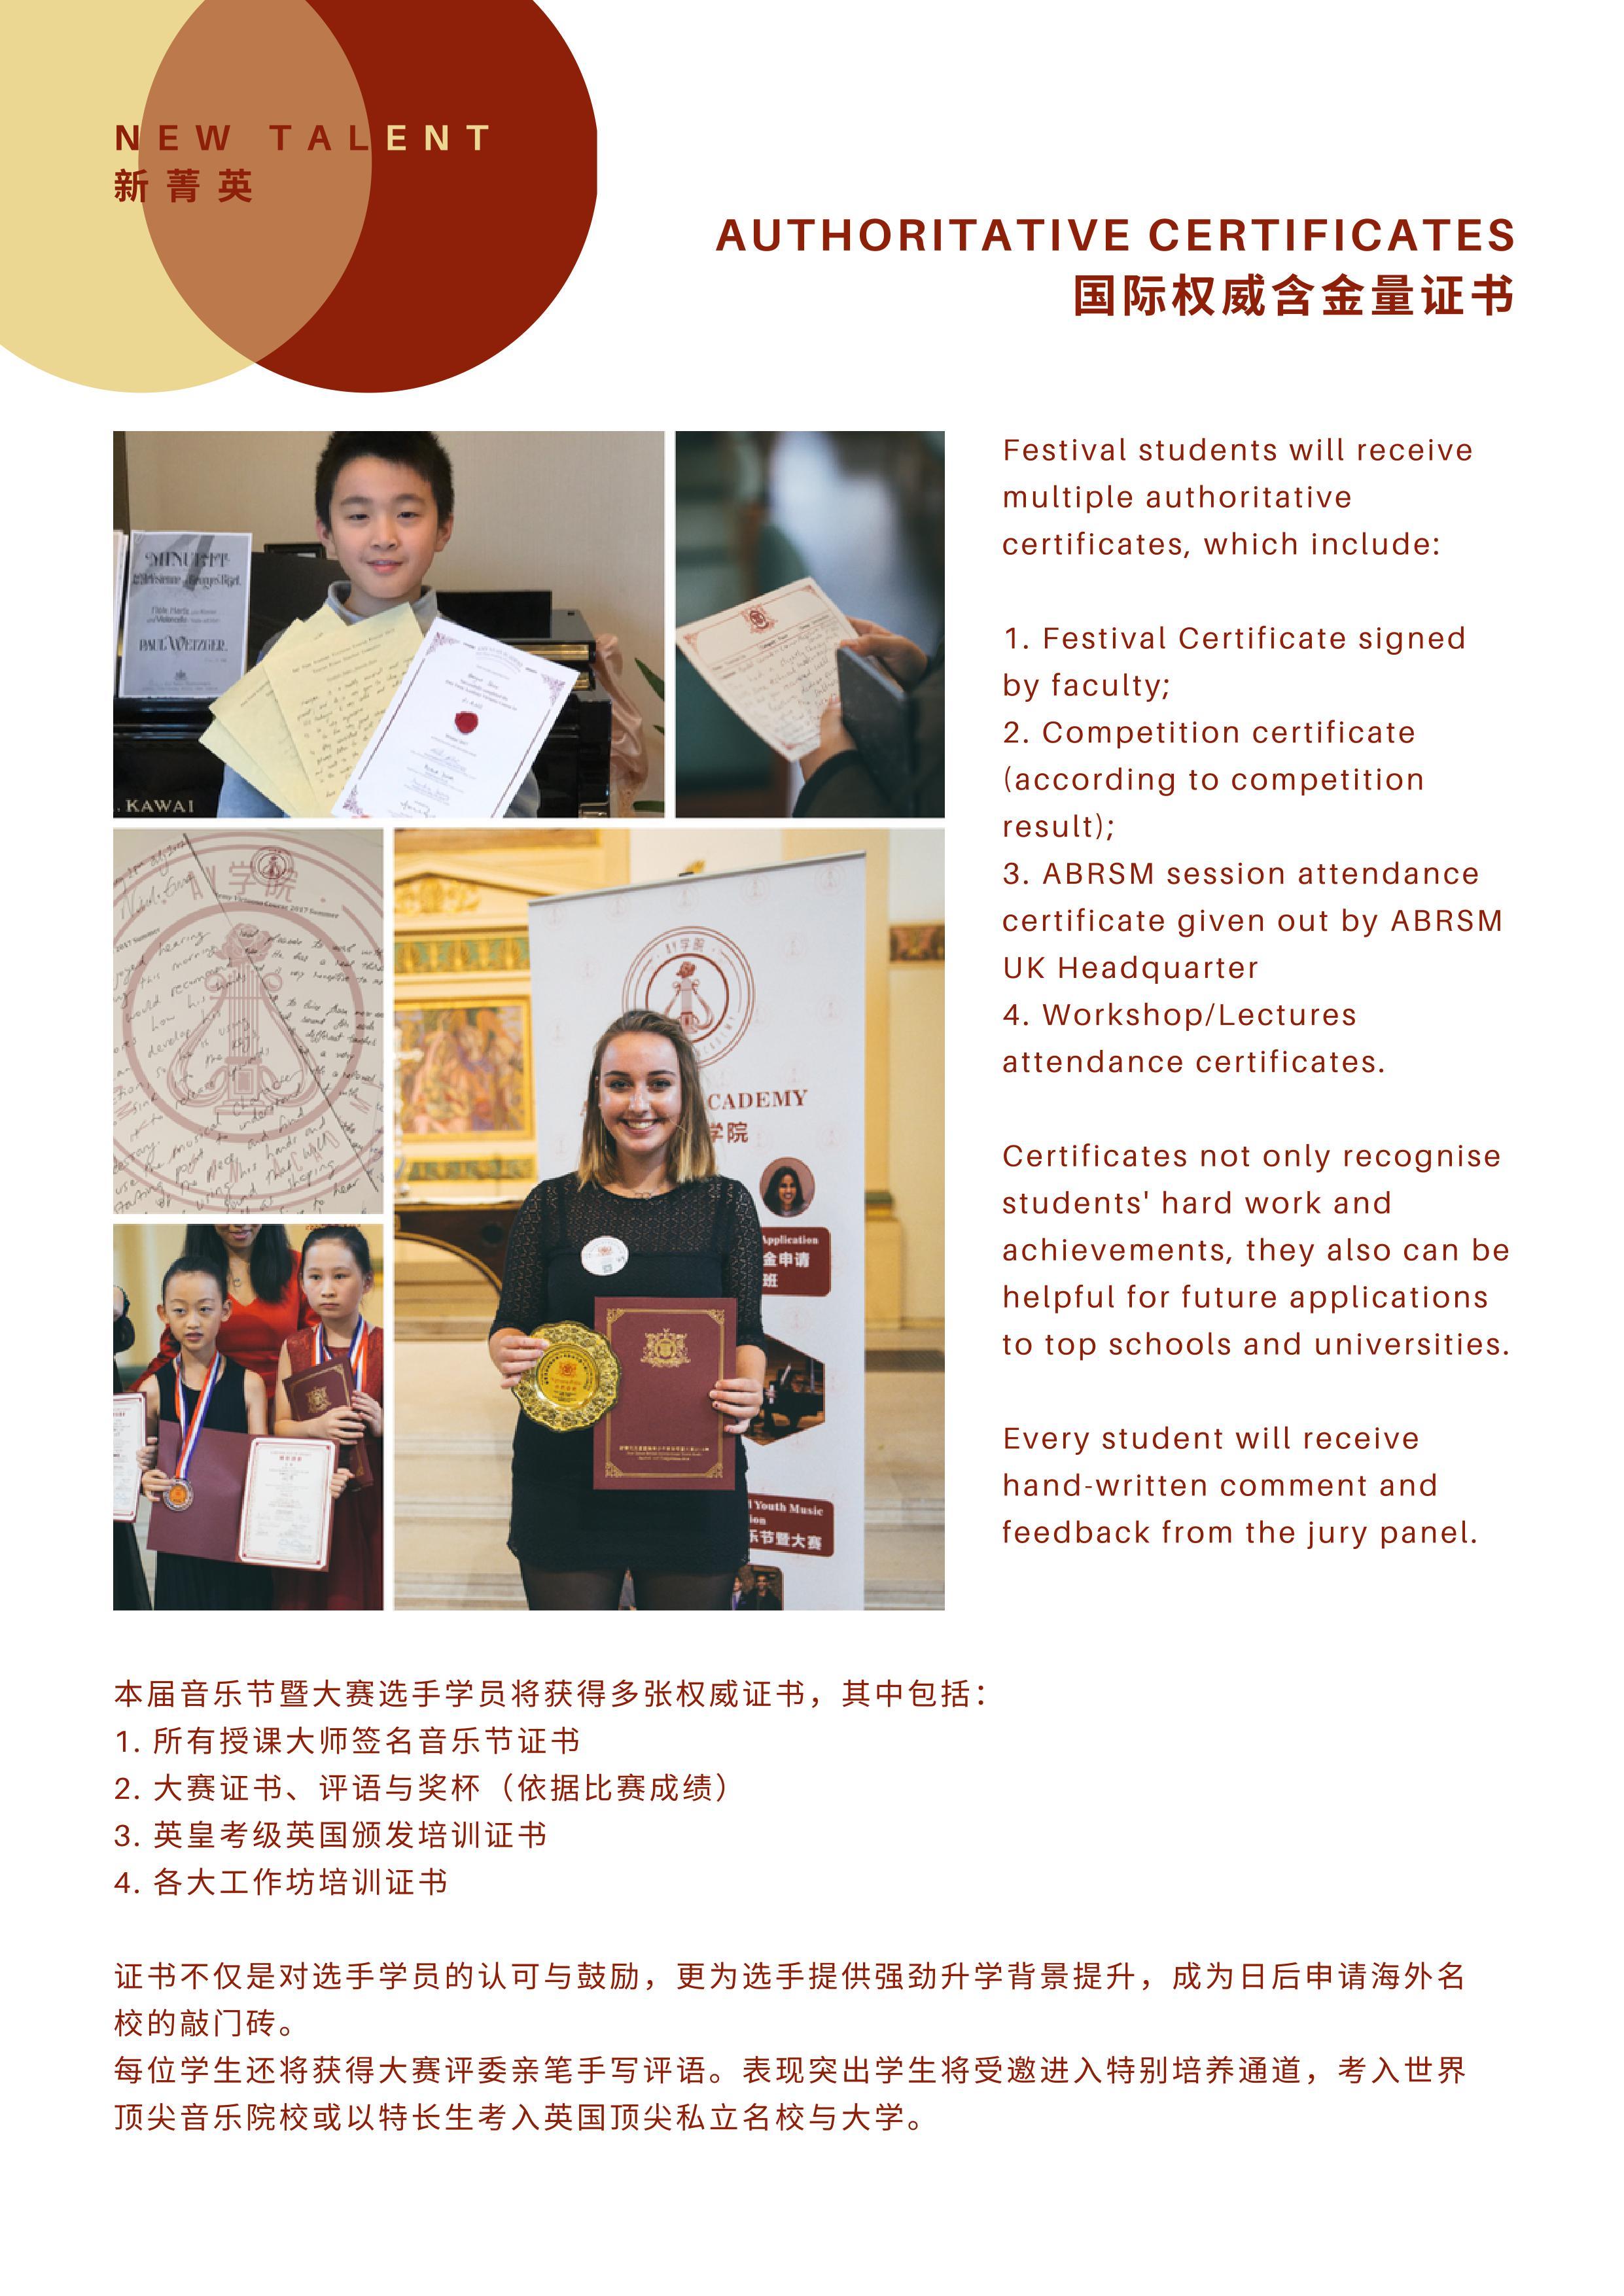 Amy Yuan Academy 2019 Brochure7.jpg